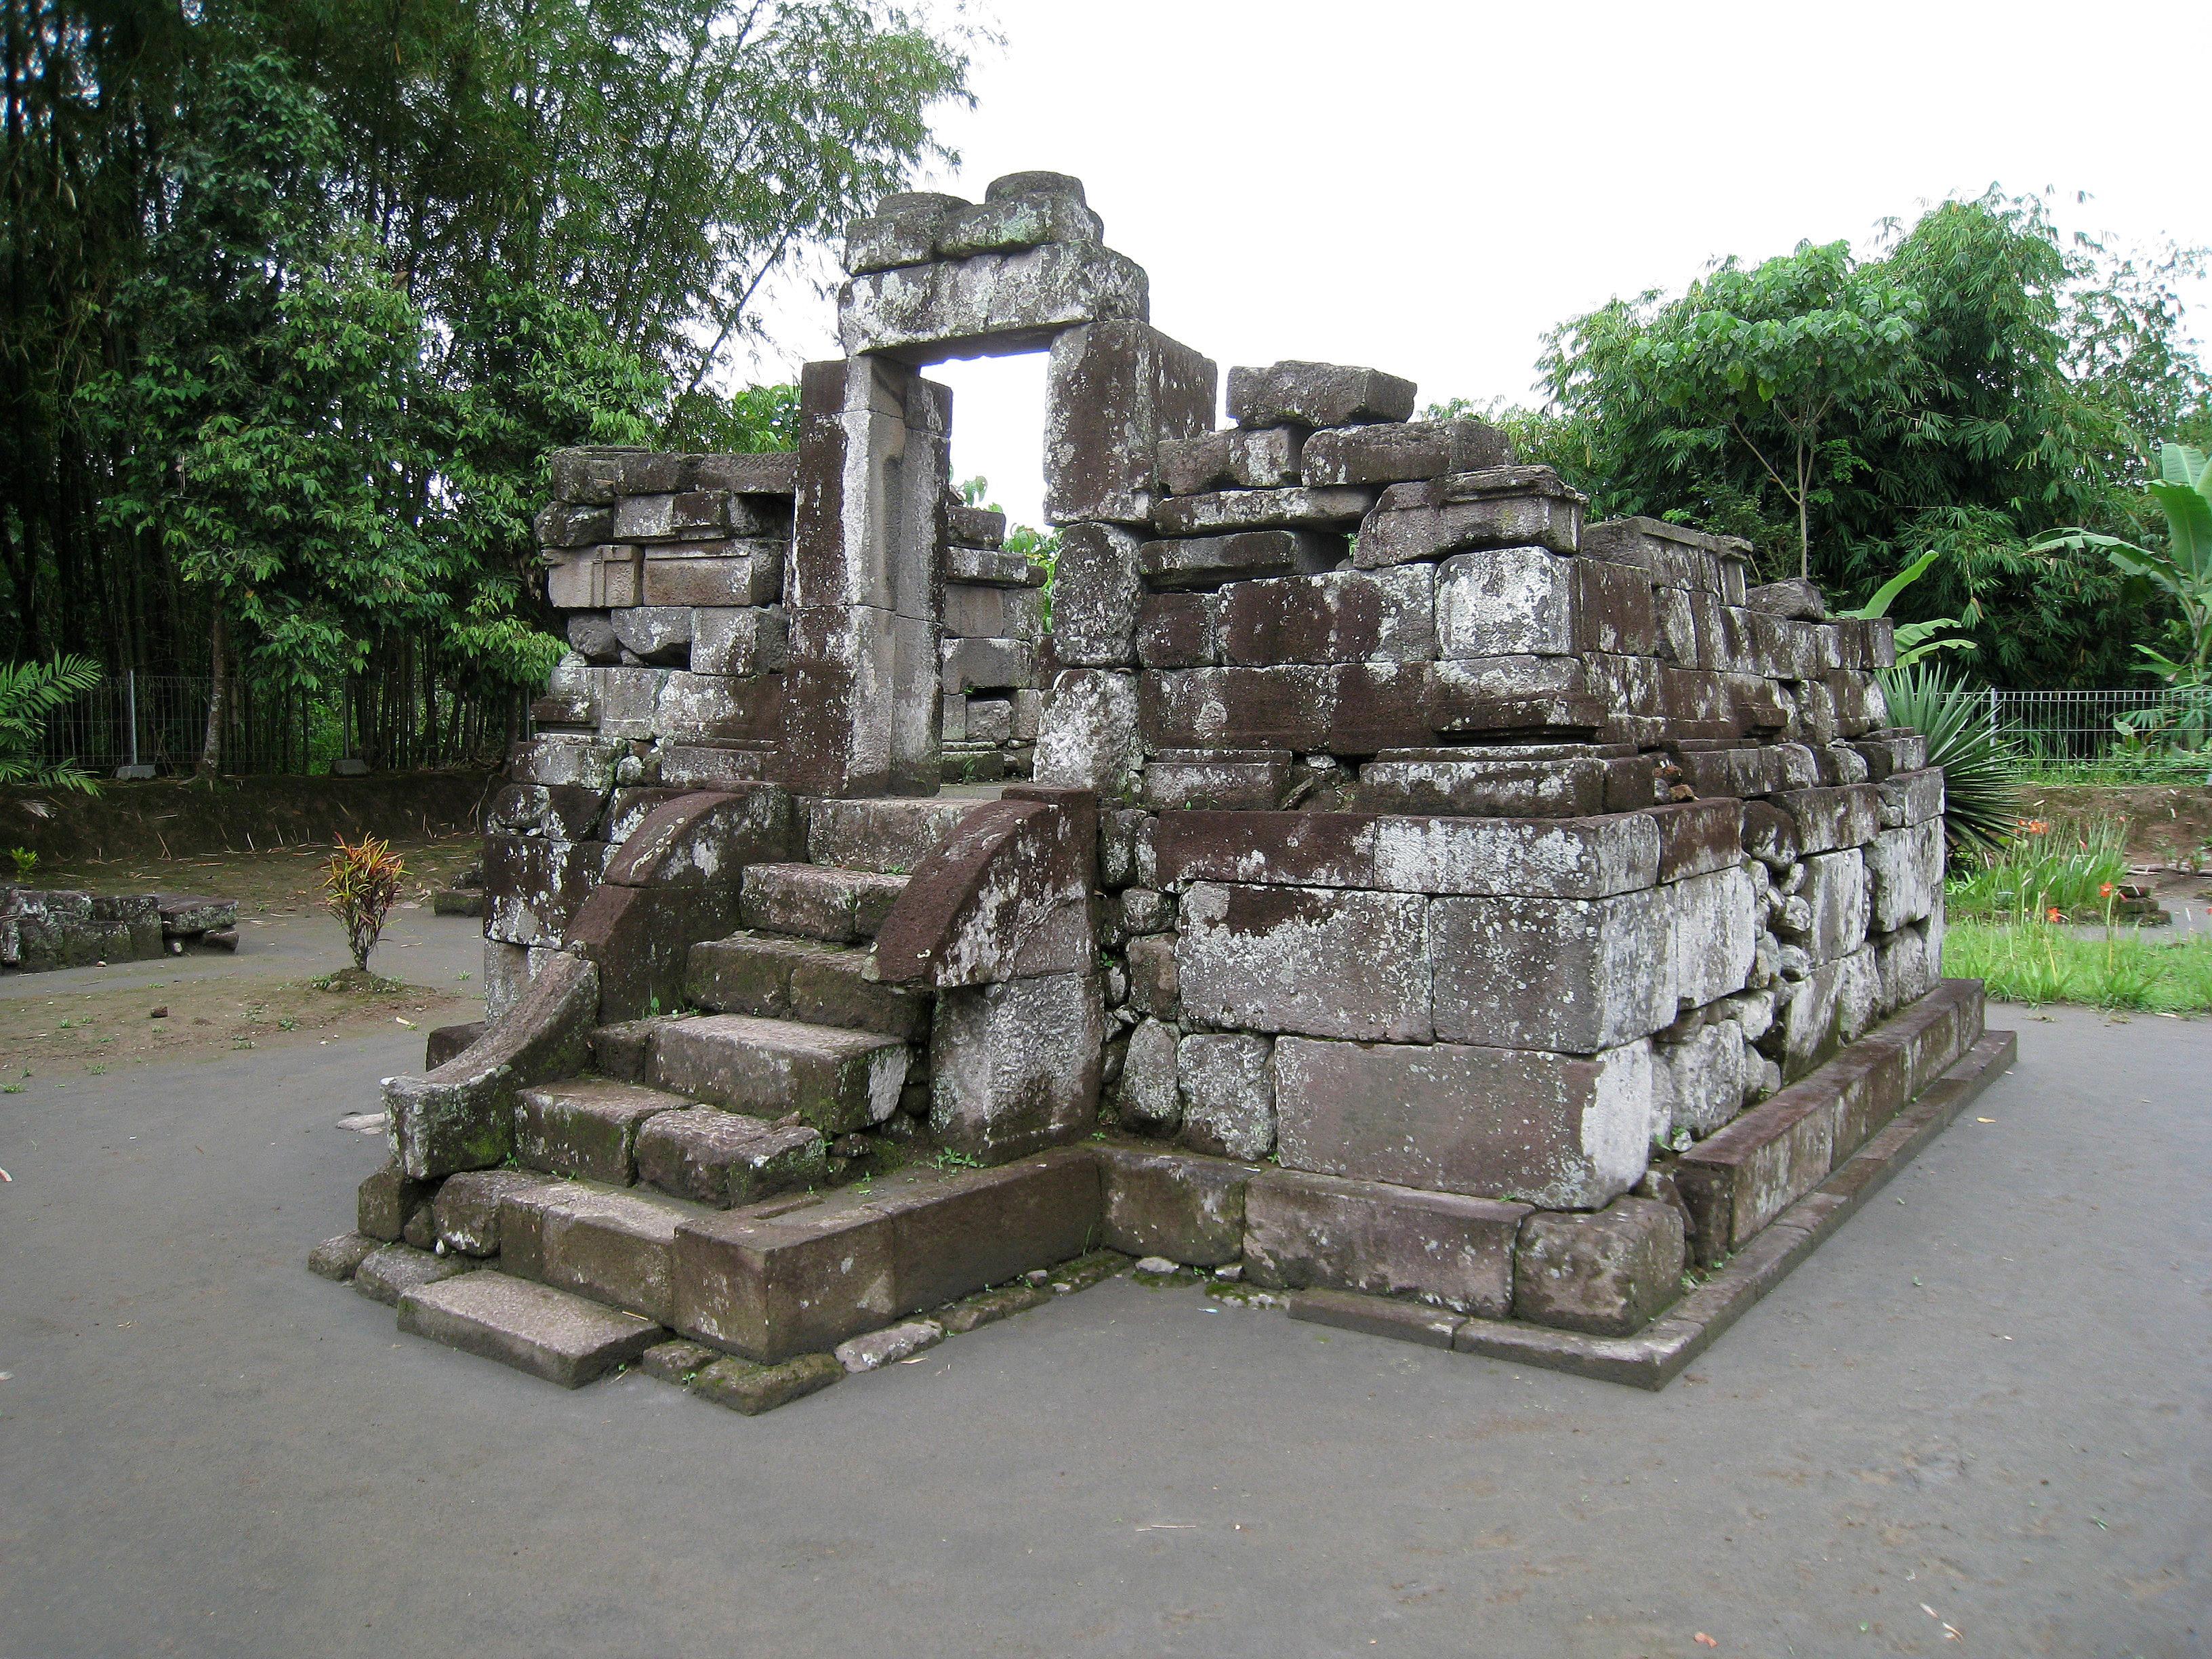 File Gunung Wukir Canggal Perwara Temple Jpg Wikimedia Commons Candi